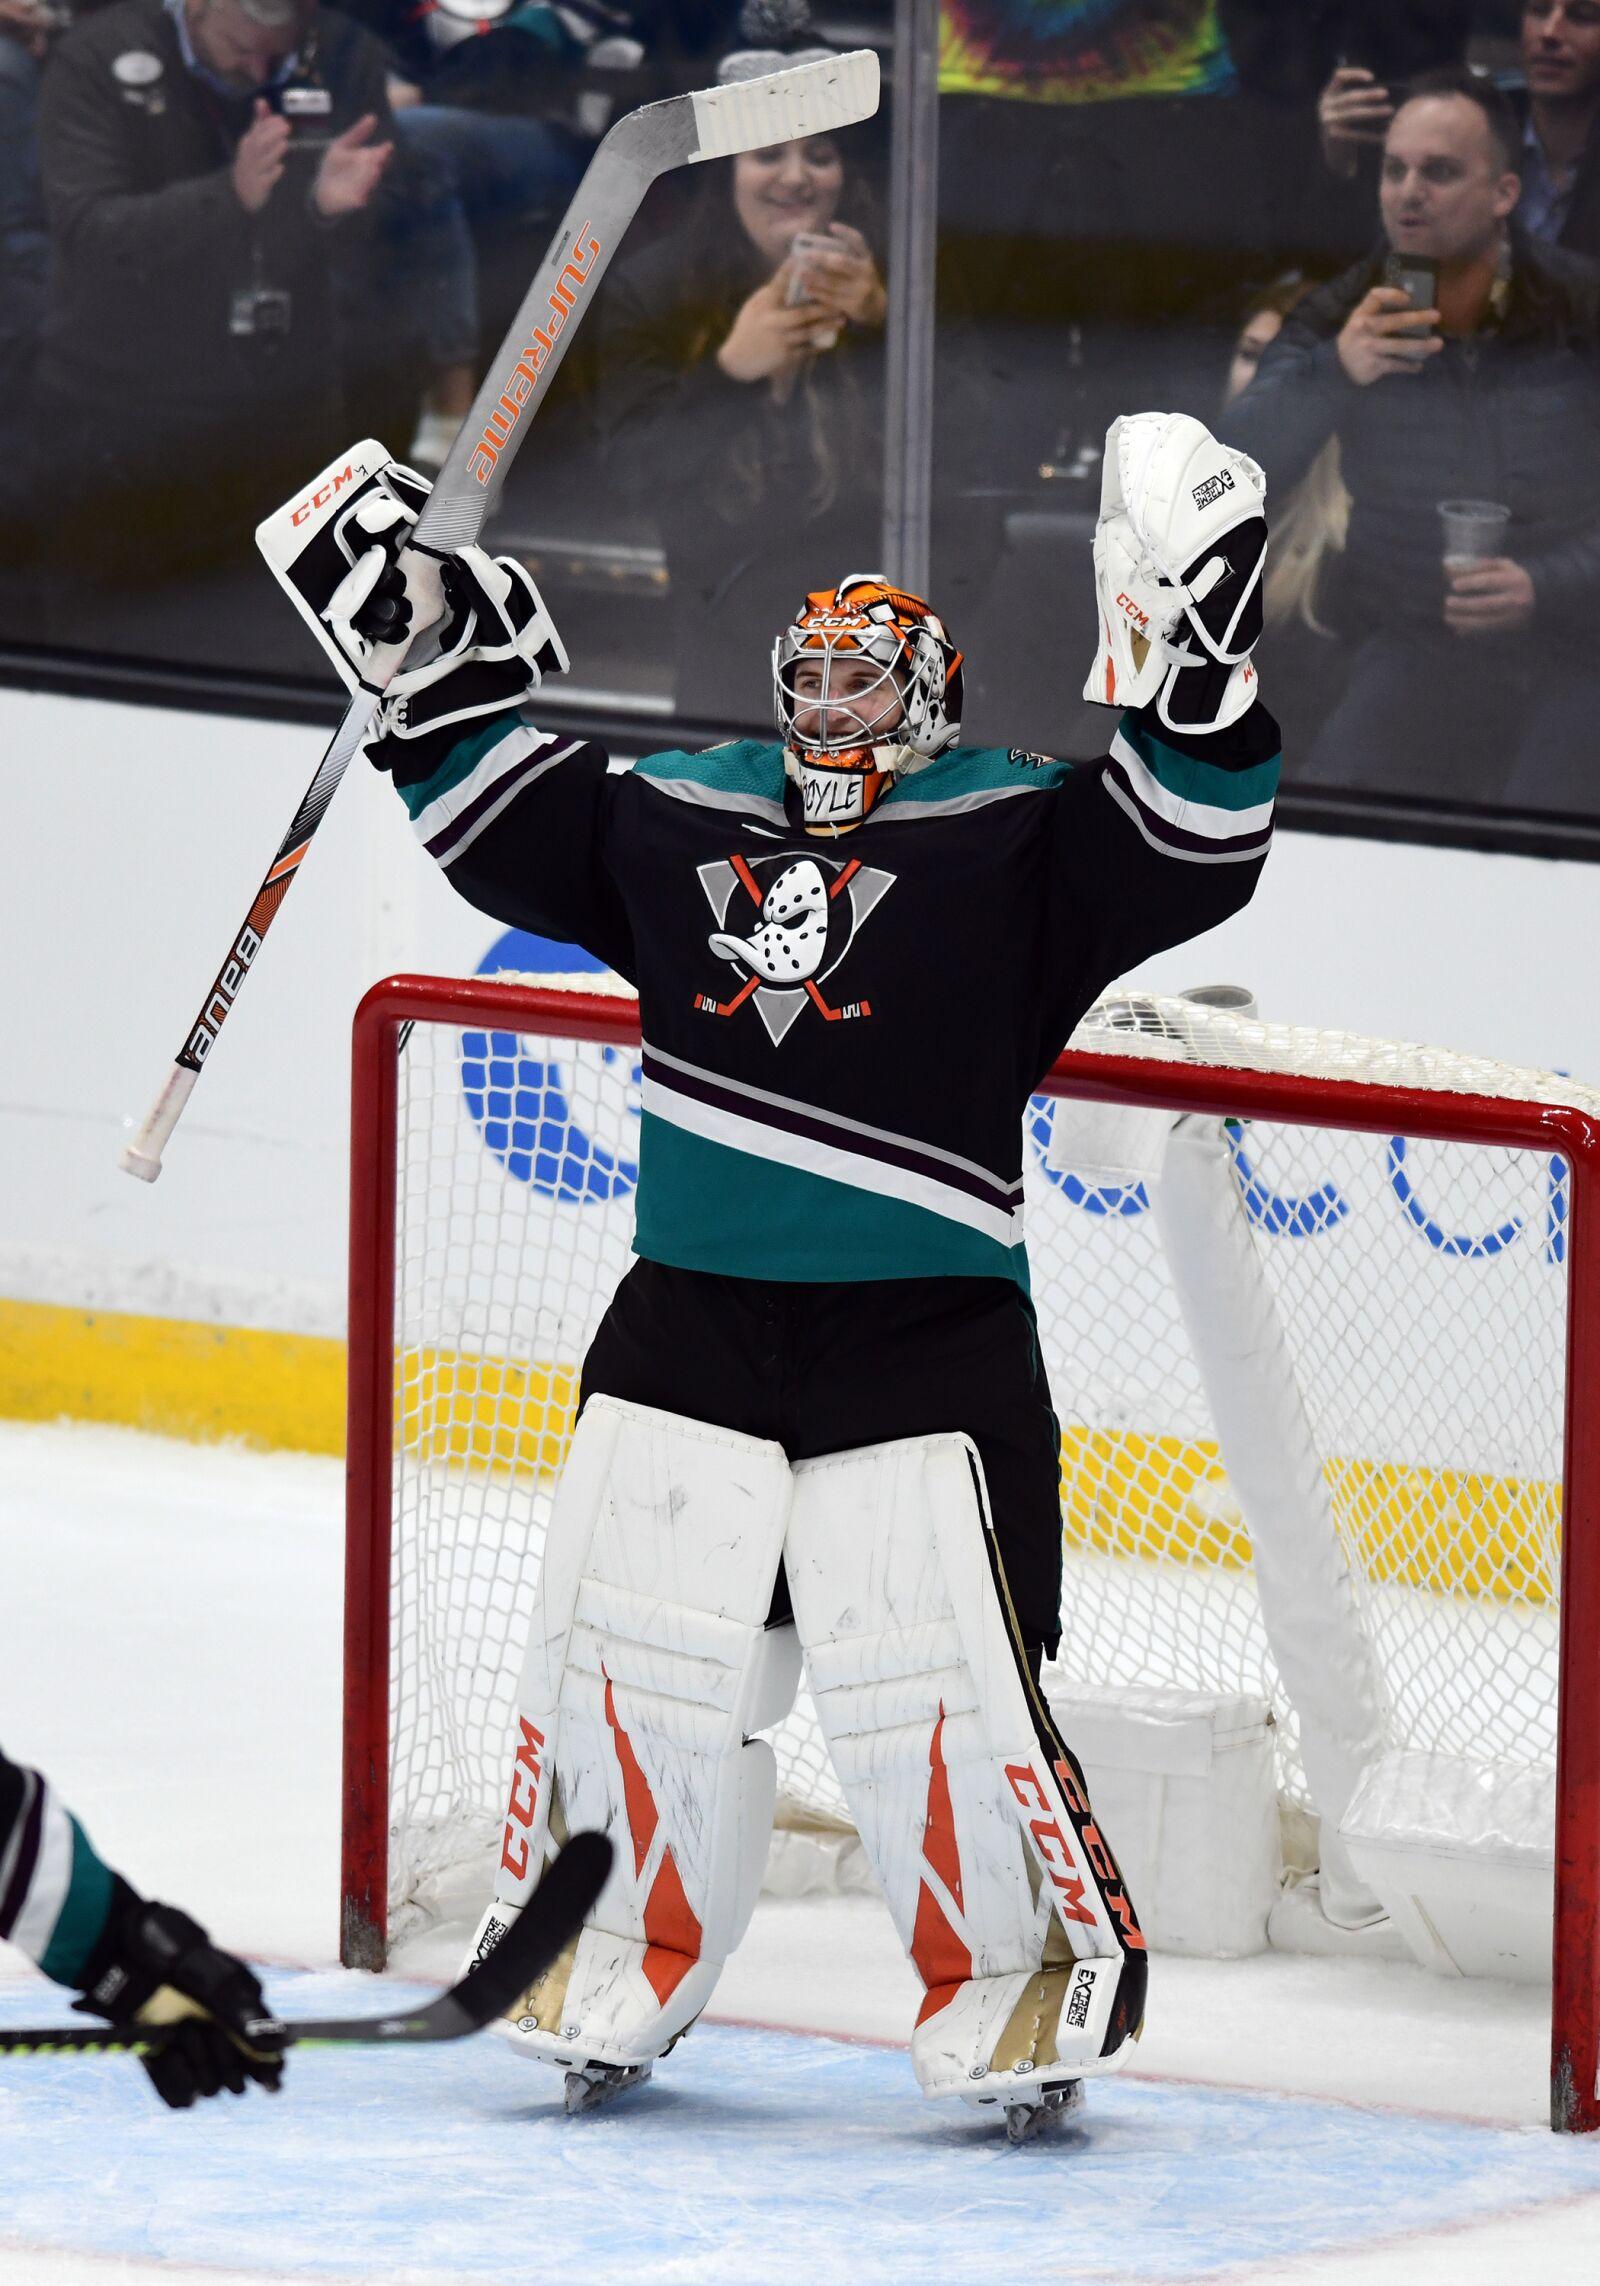 PODCAST: Anaheim Ducks Goalie Woes, Bob Murray's Start, and Trade Deadline Approaches